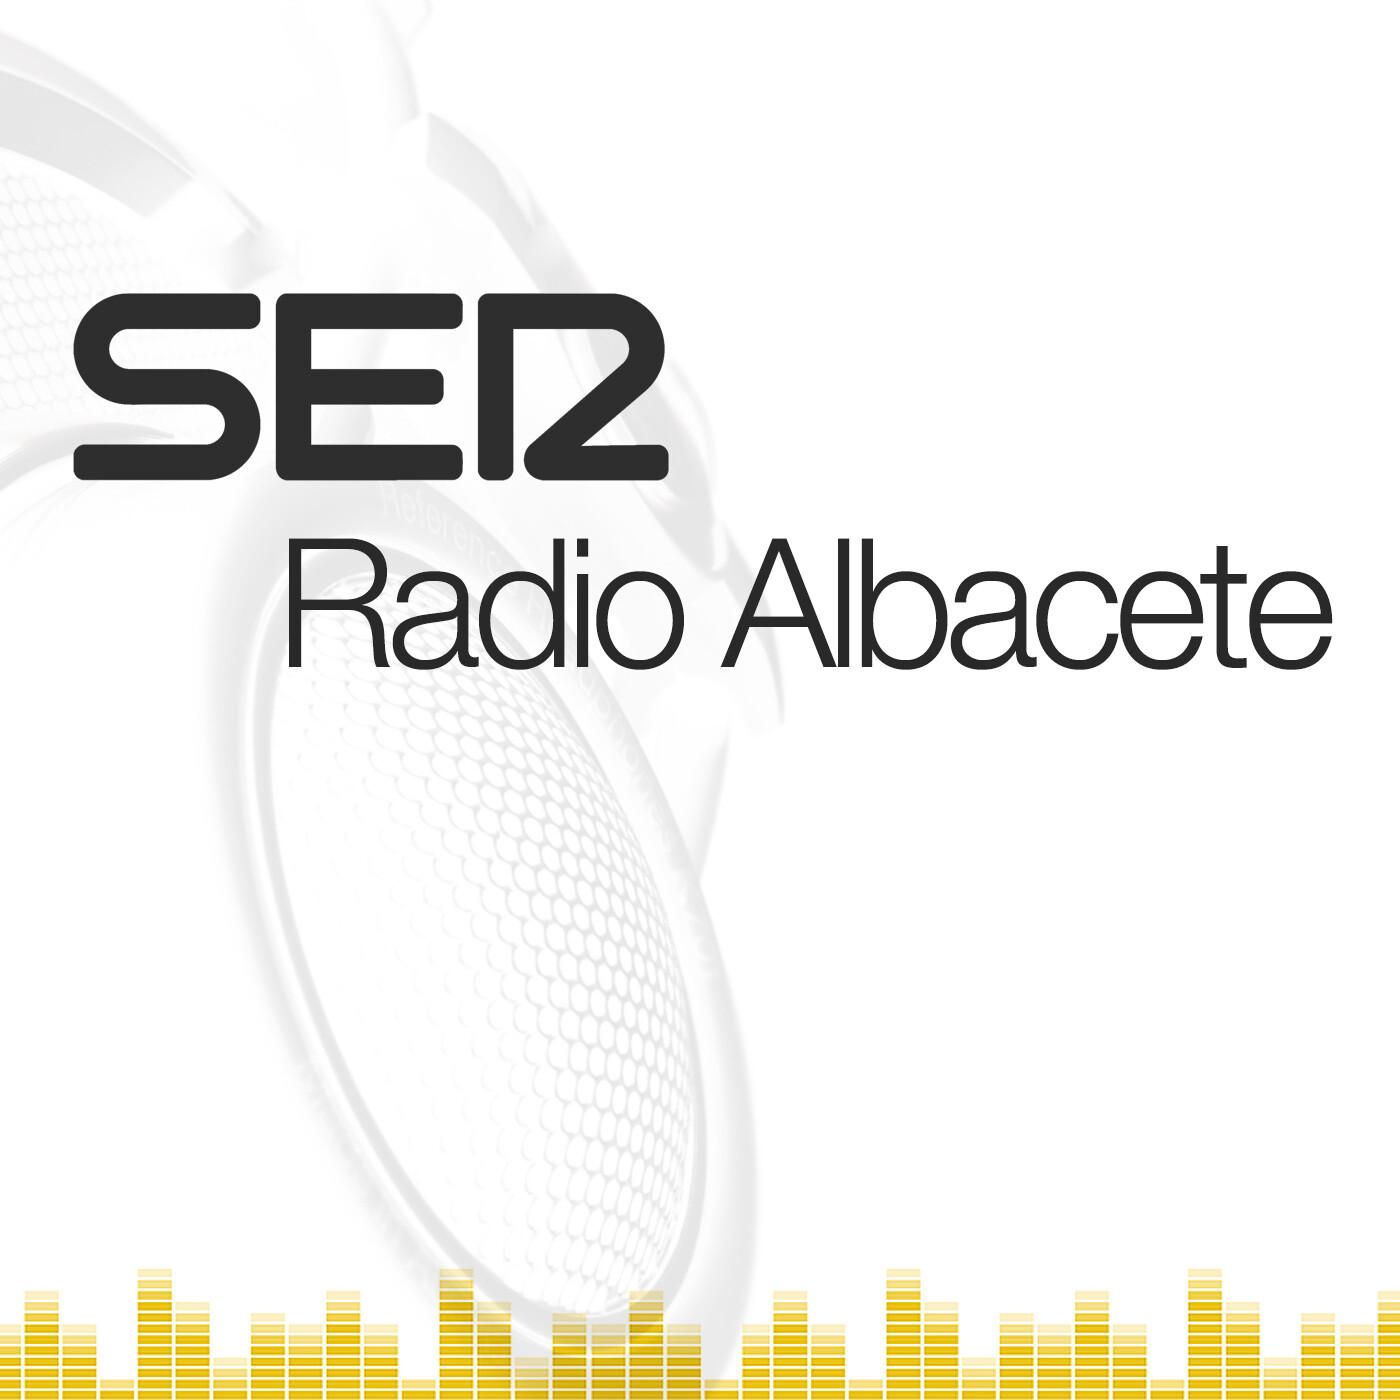 Radio Albacete